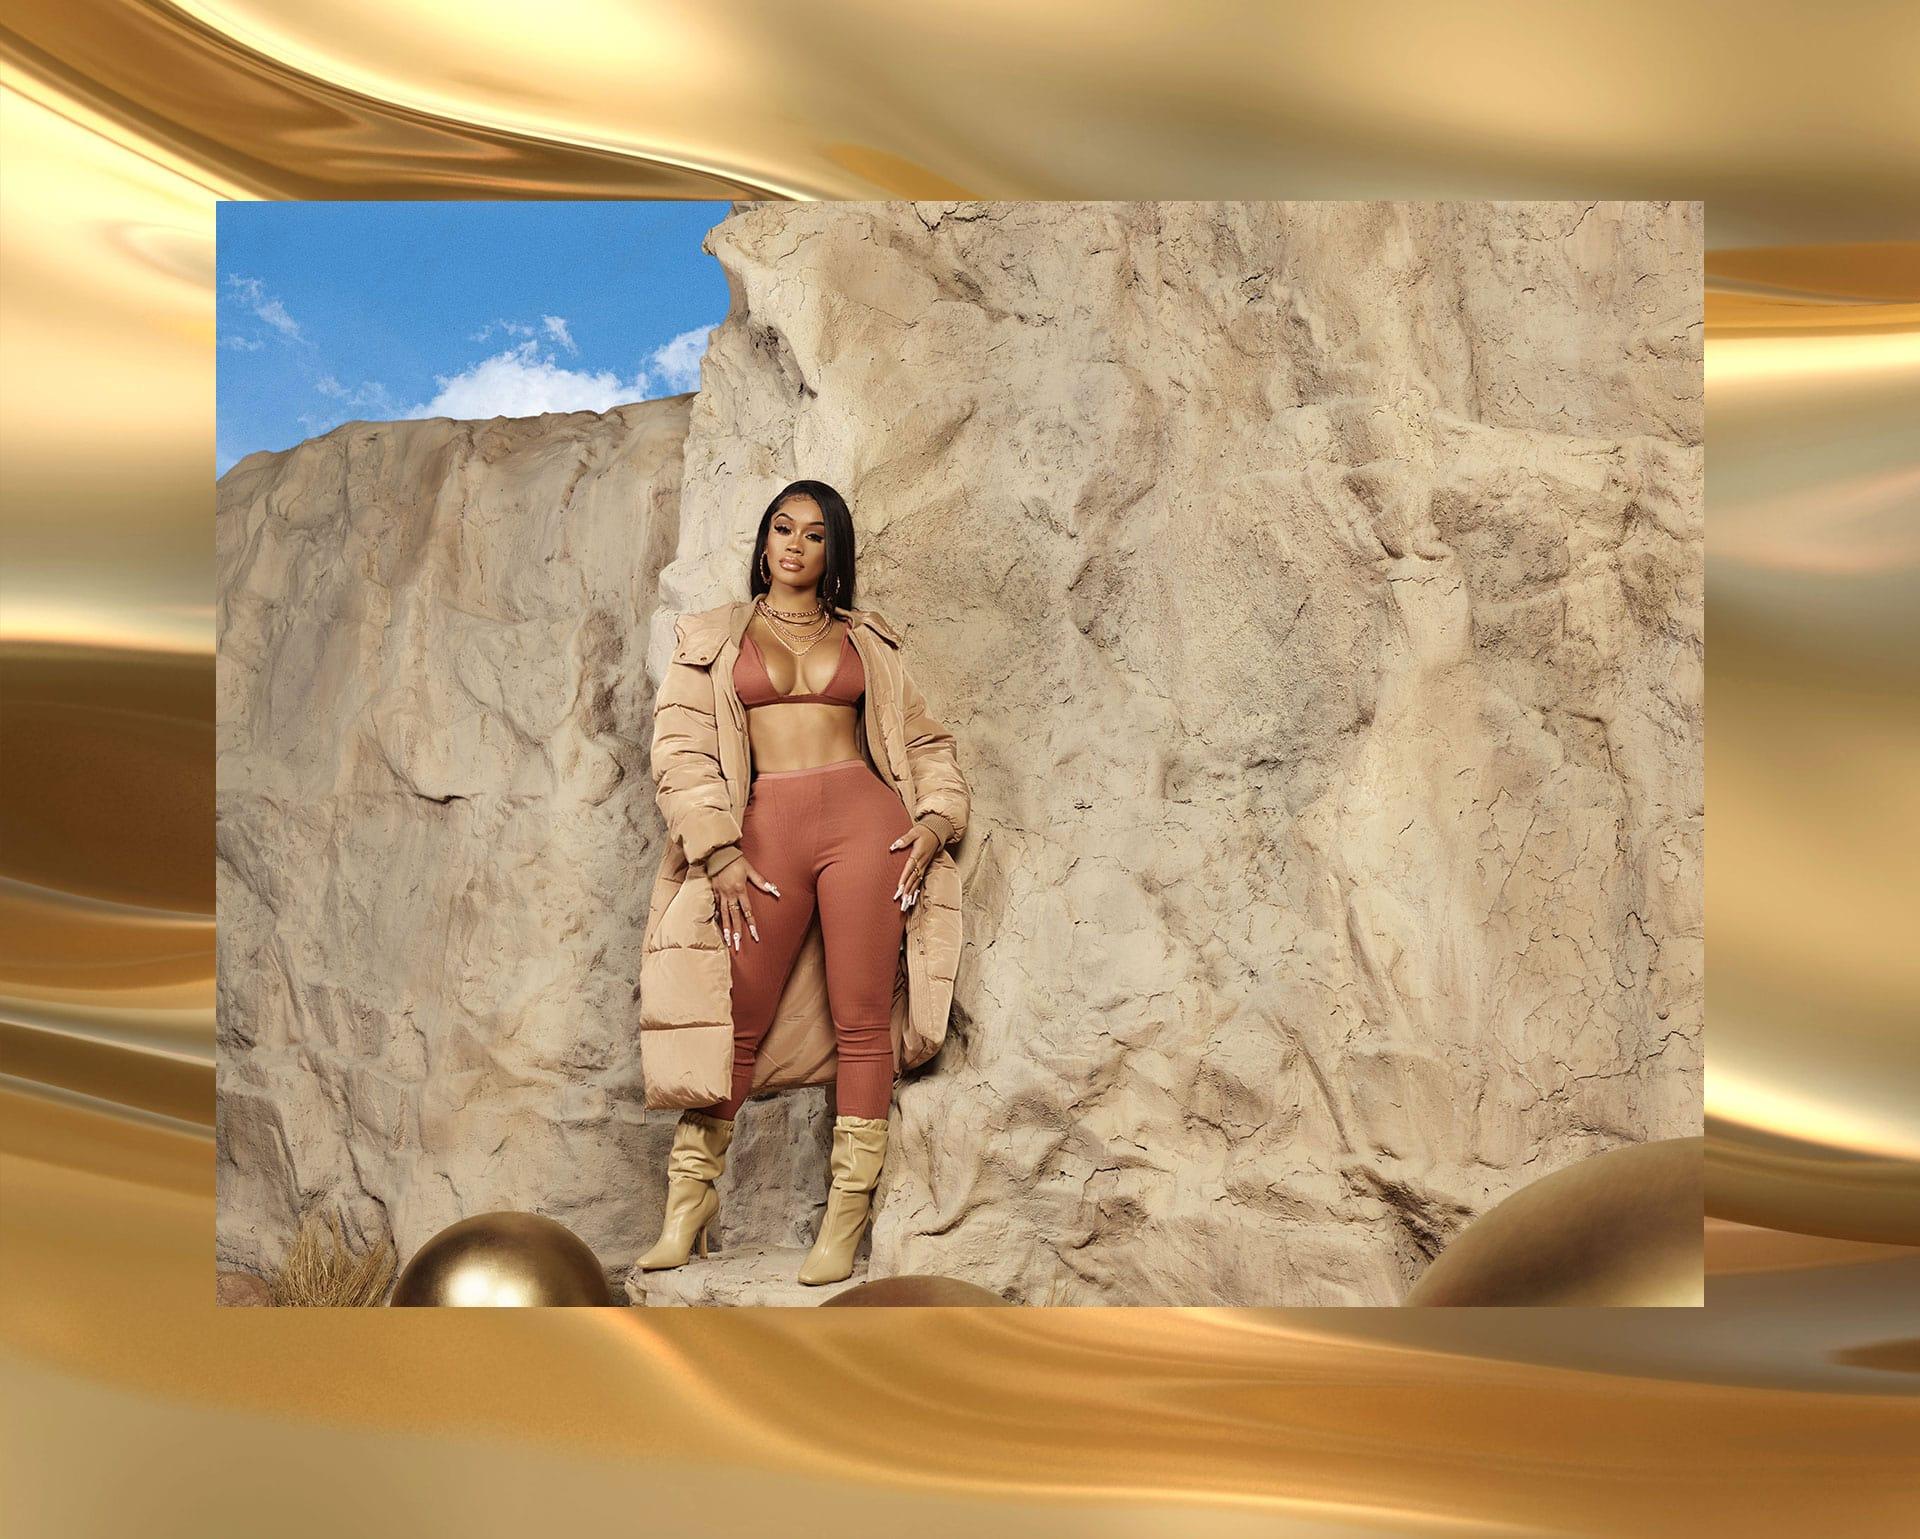 Saweetie Lookbook Image 9 Desktop